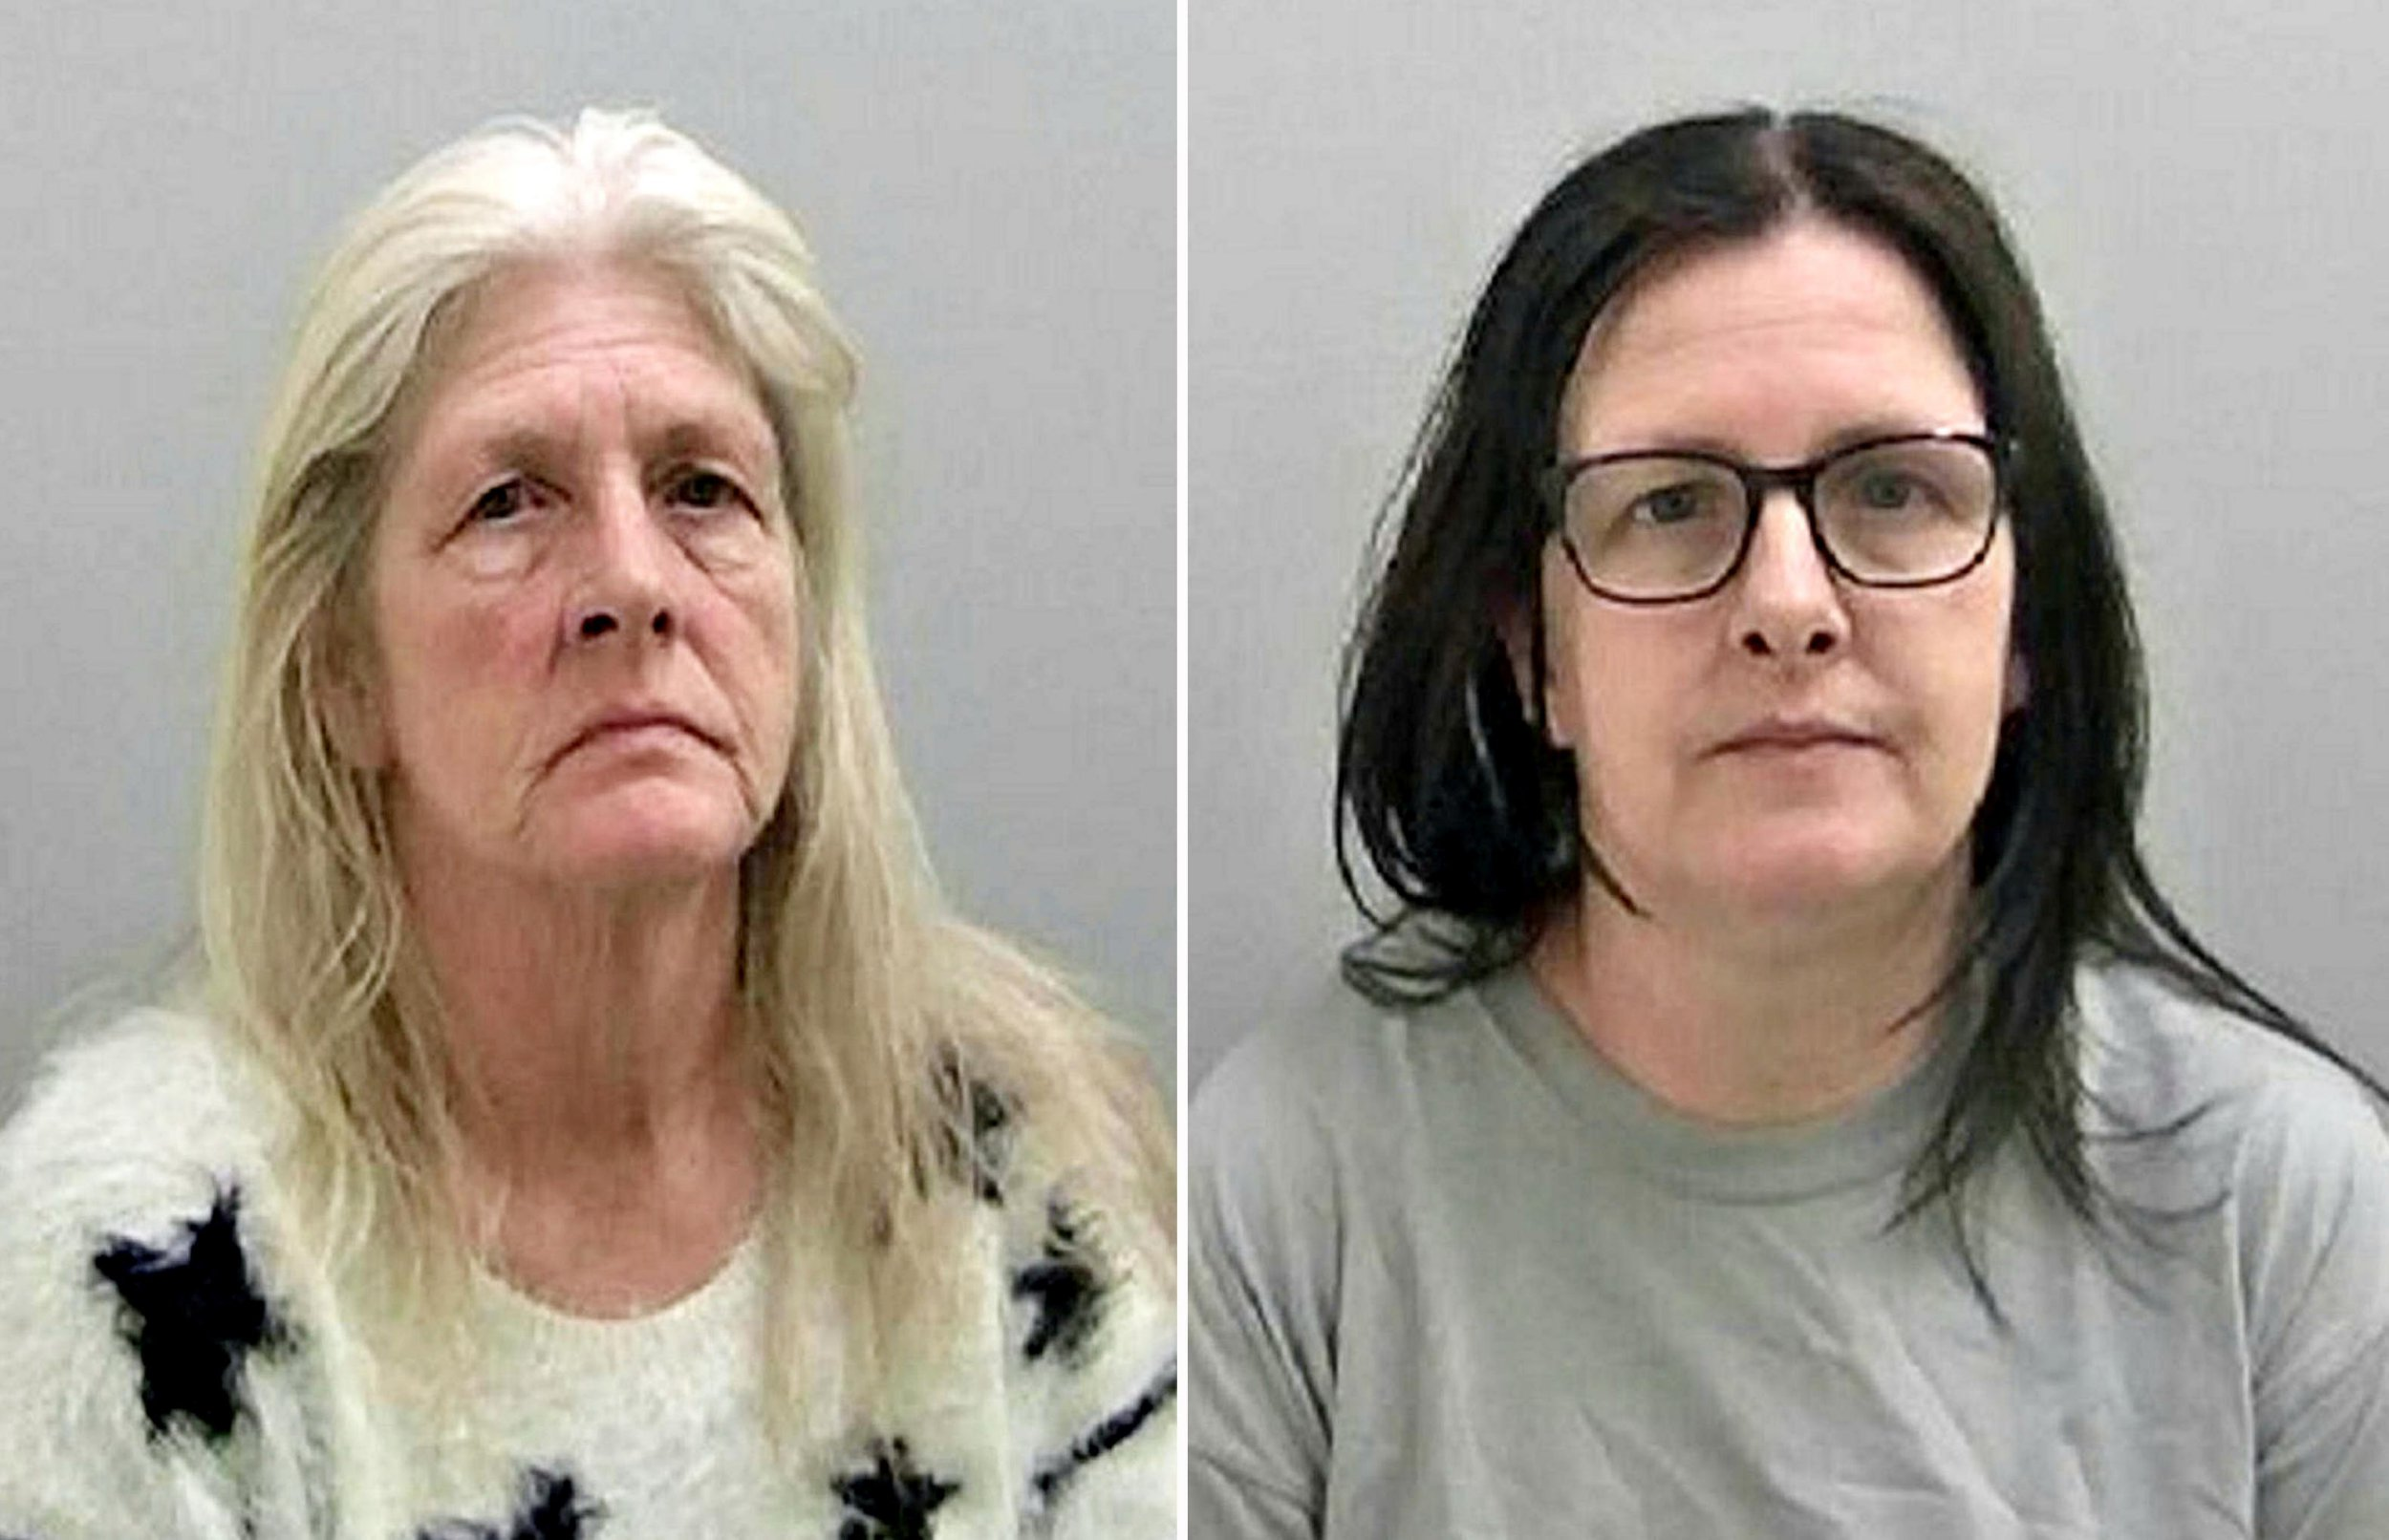 Mum and daughter carers avoid jail for stealing pensioner's life savings